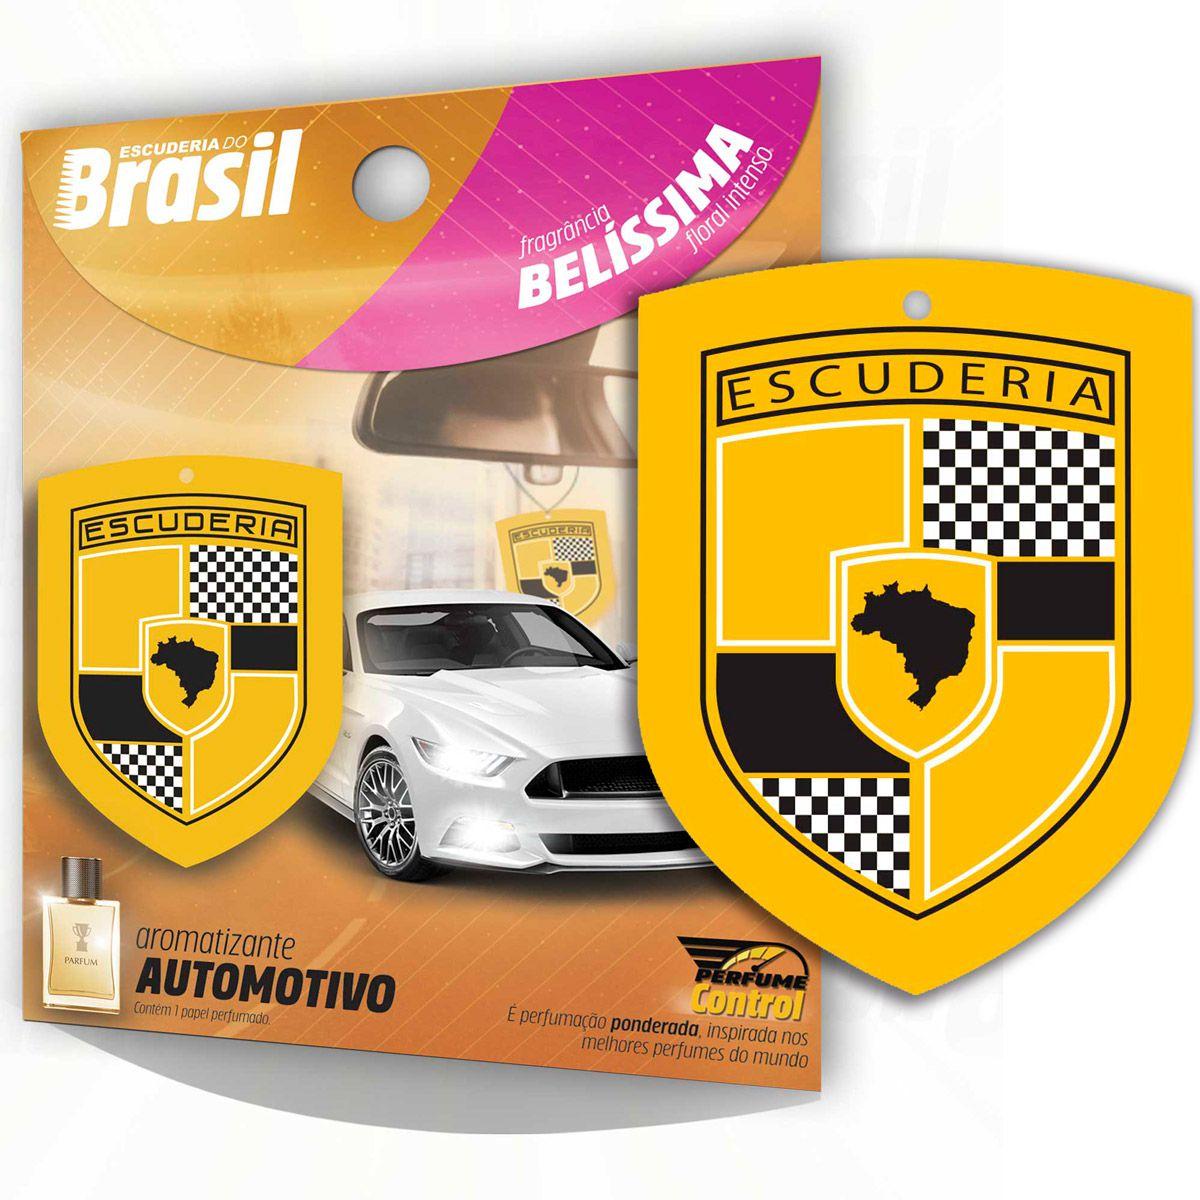 Aromatizante Automotivo Escuderia Brasil - Perfume Belíssima